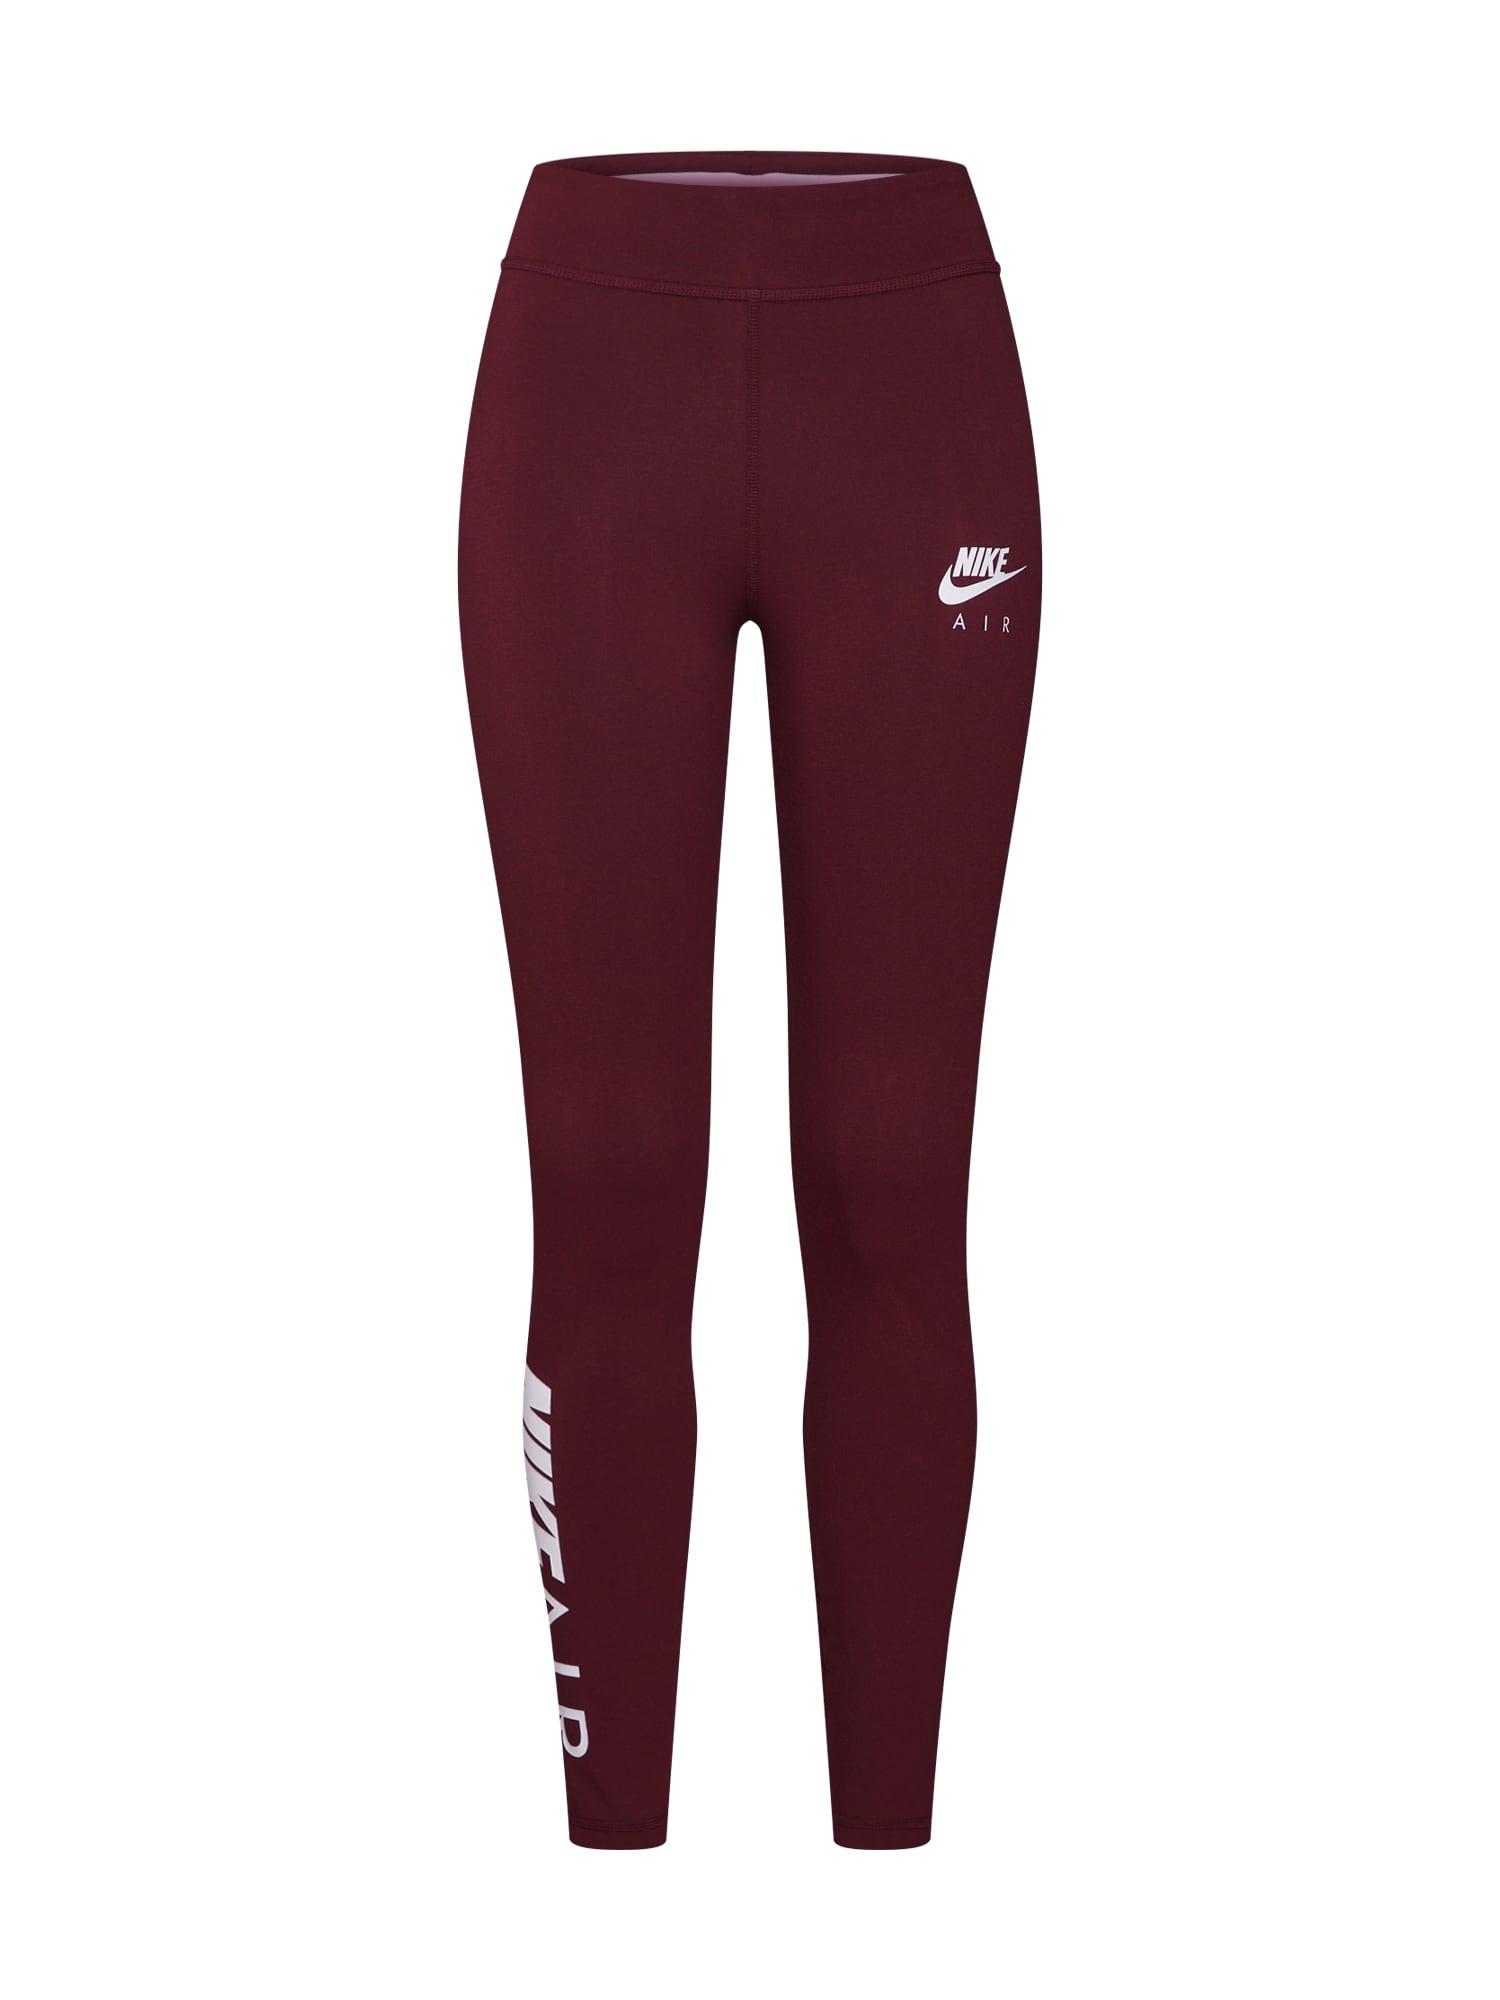 Legíny NSW AIR LGGNG vínově červená bílá Nike Sportswear